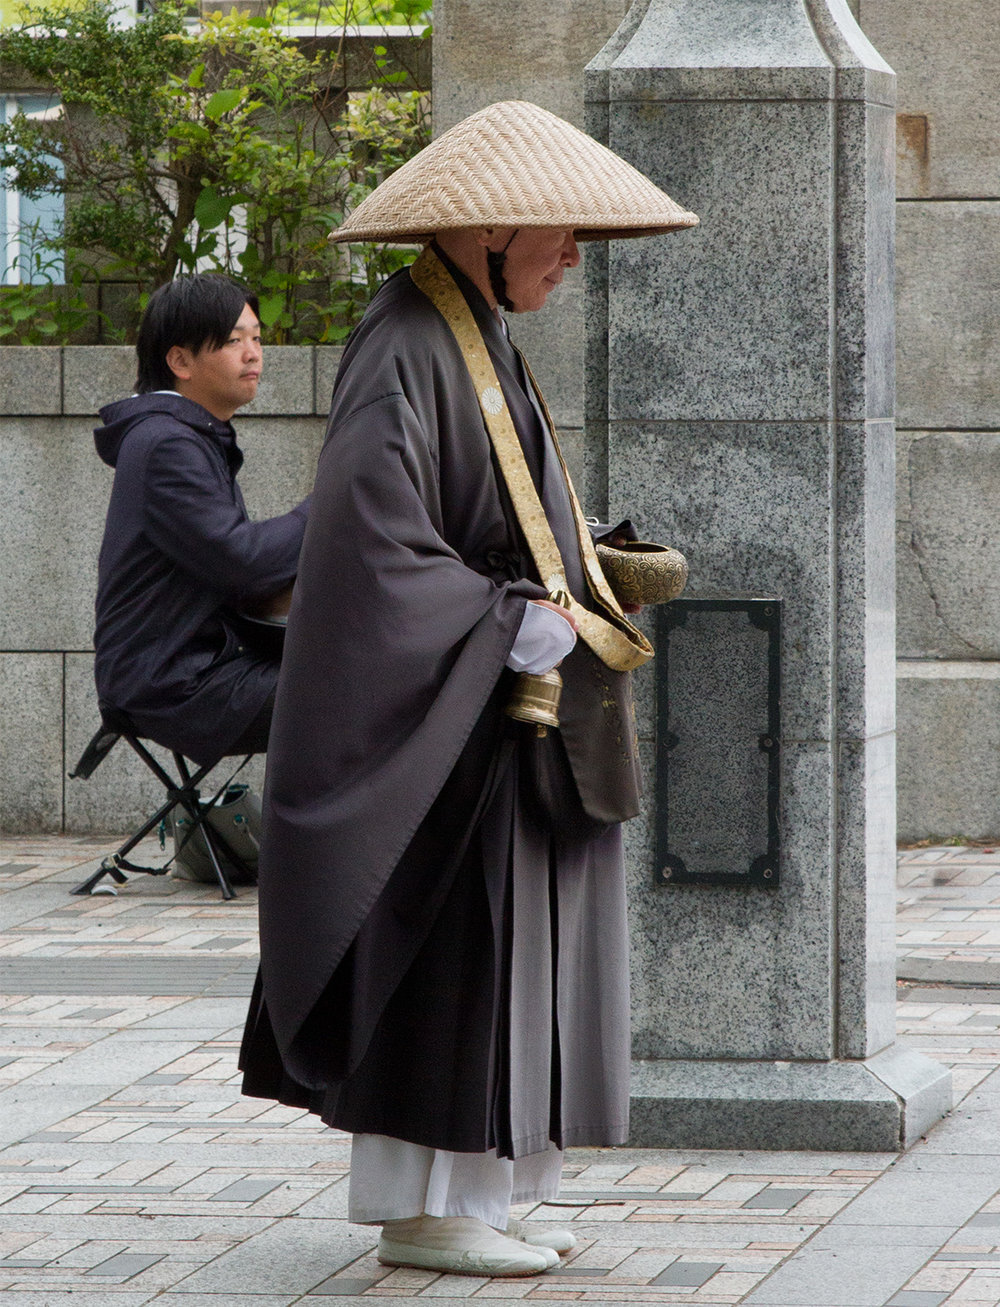 Monk, Begging